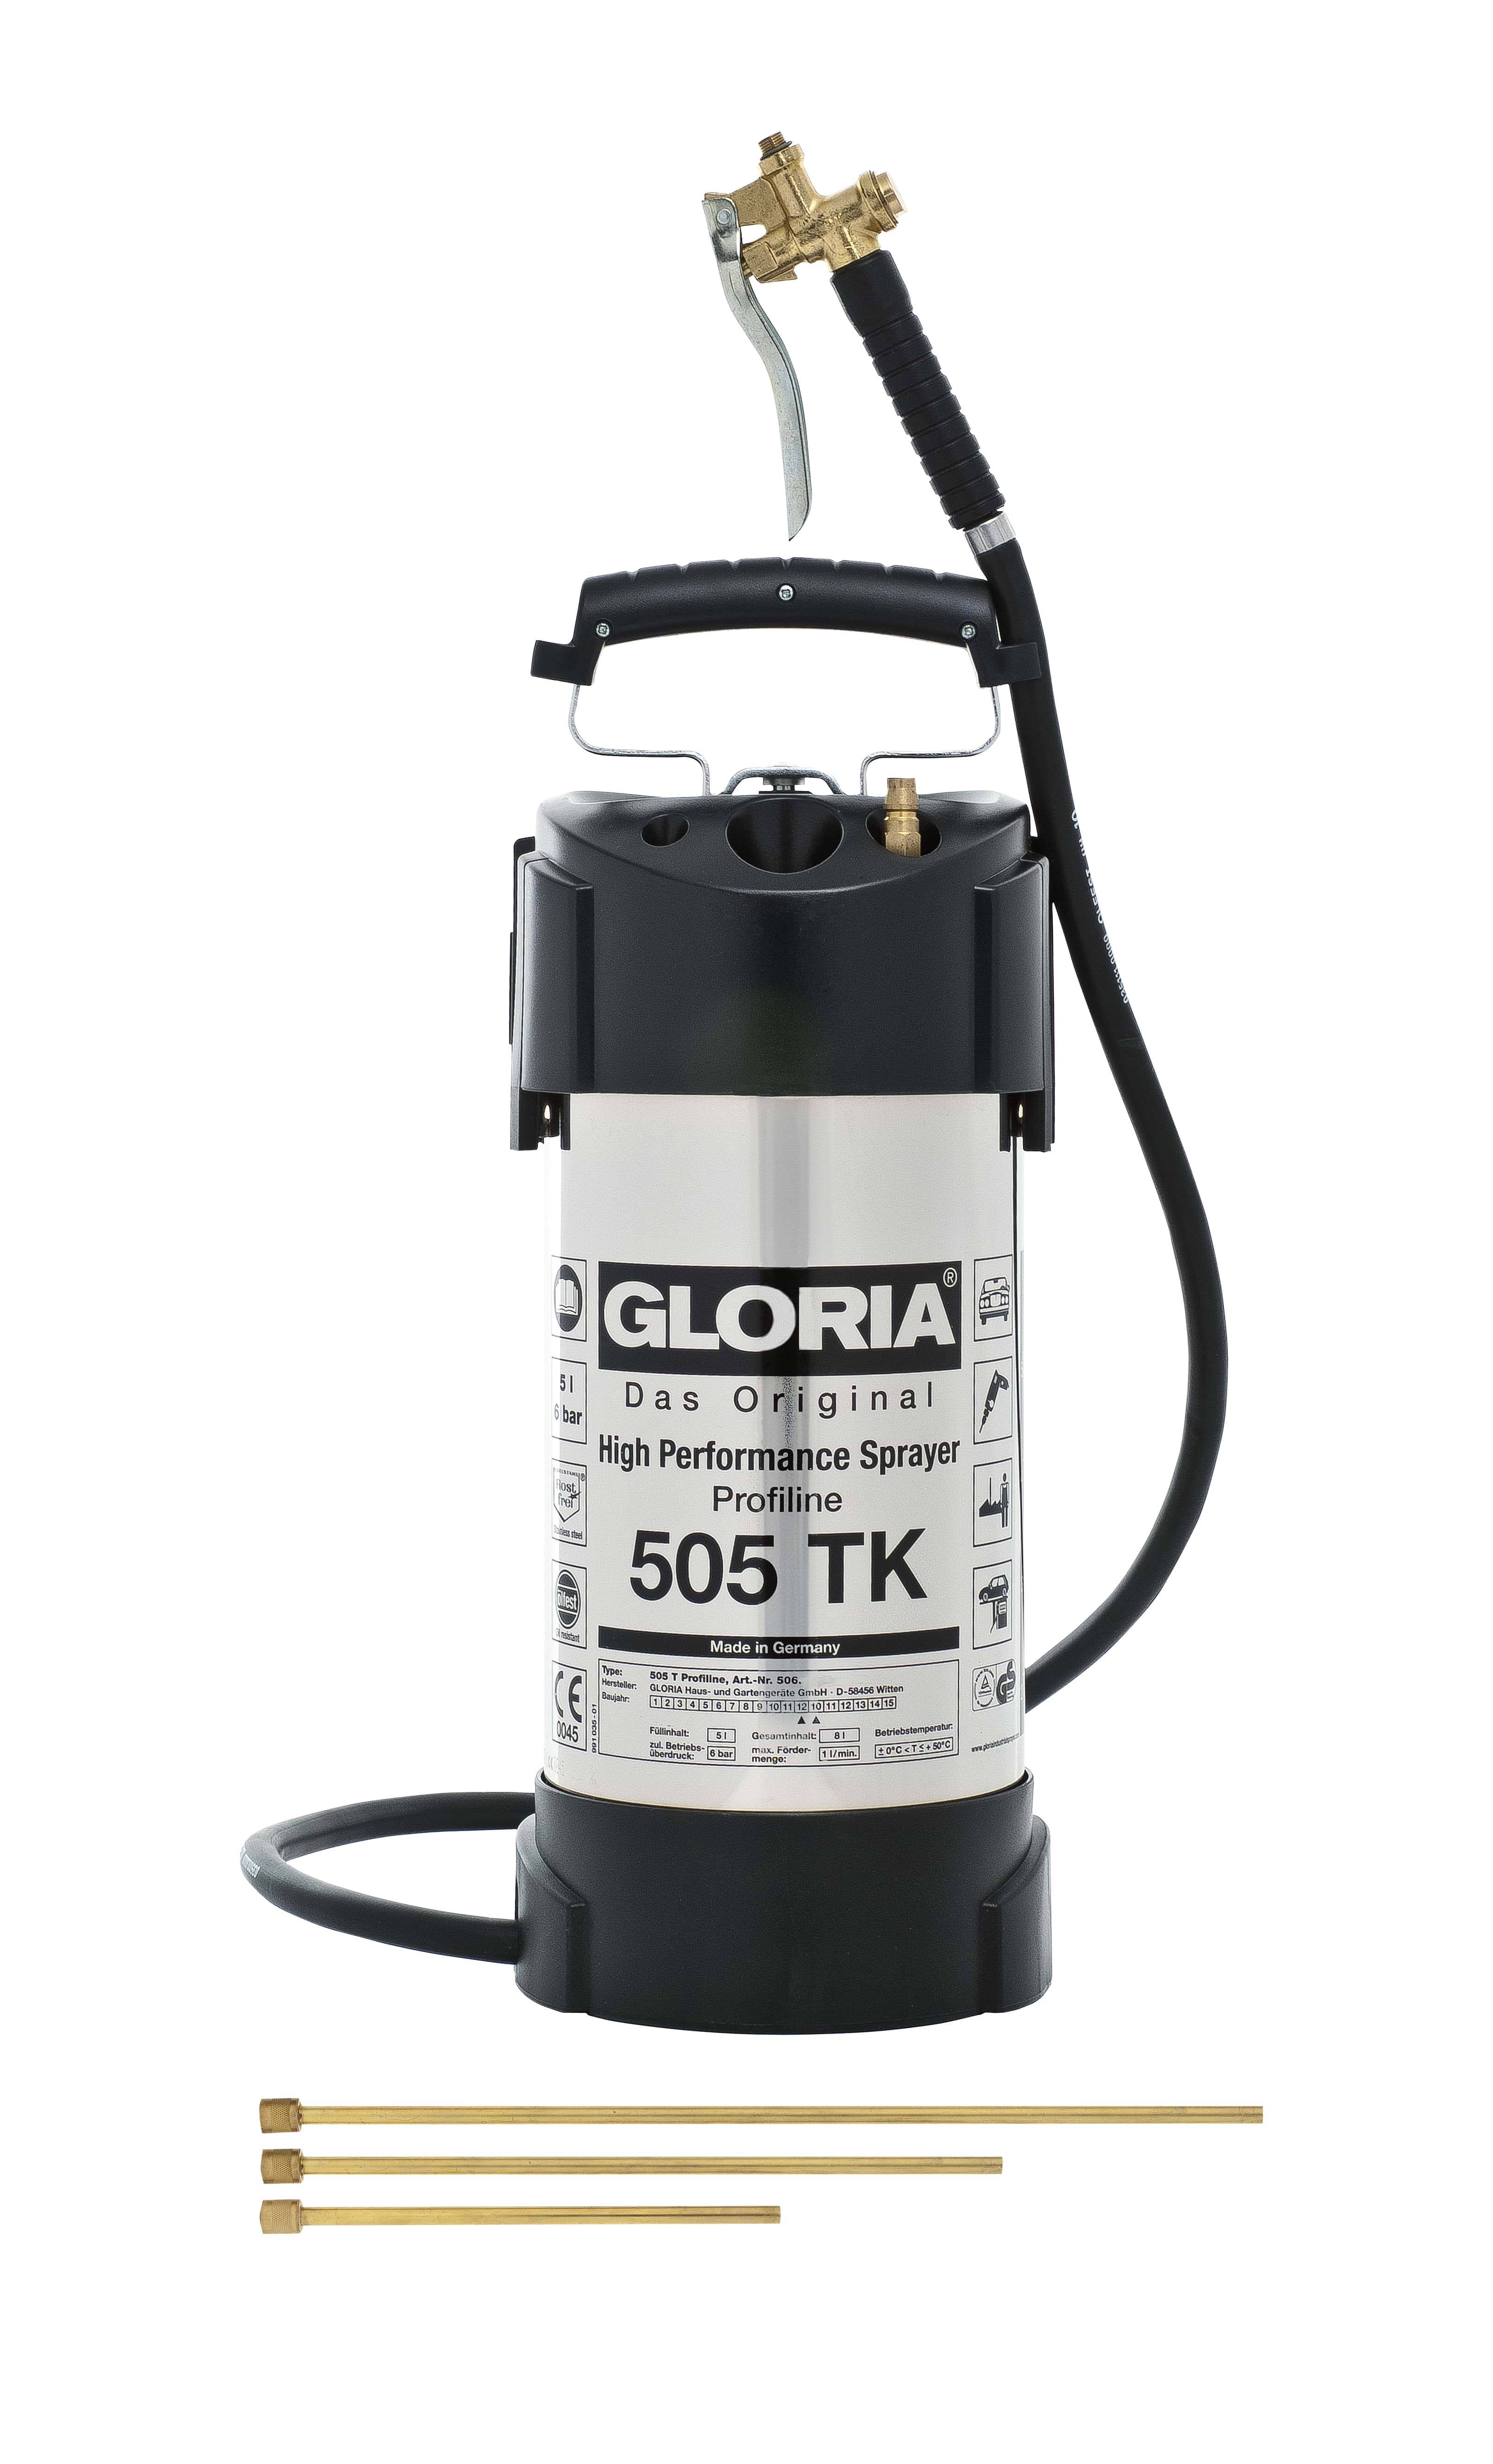 Gloria Heavy Duty Stainless Steel Sprayer 10 0l 510tk